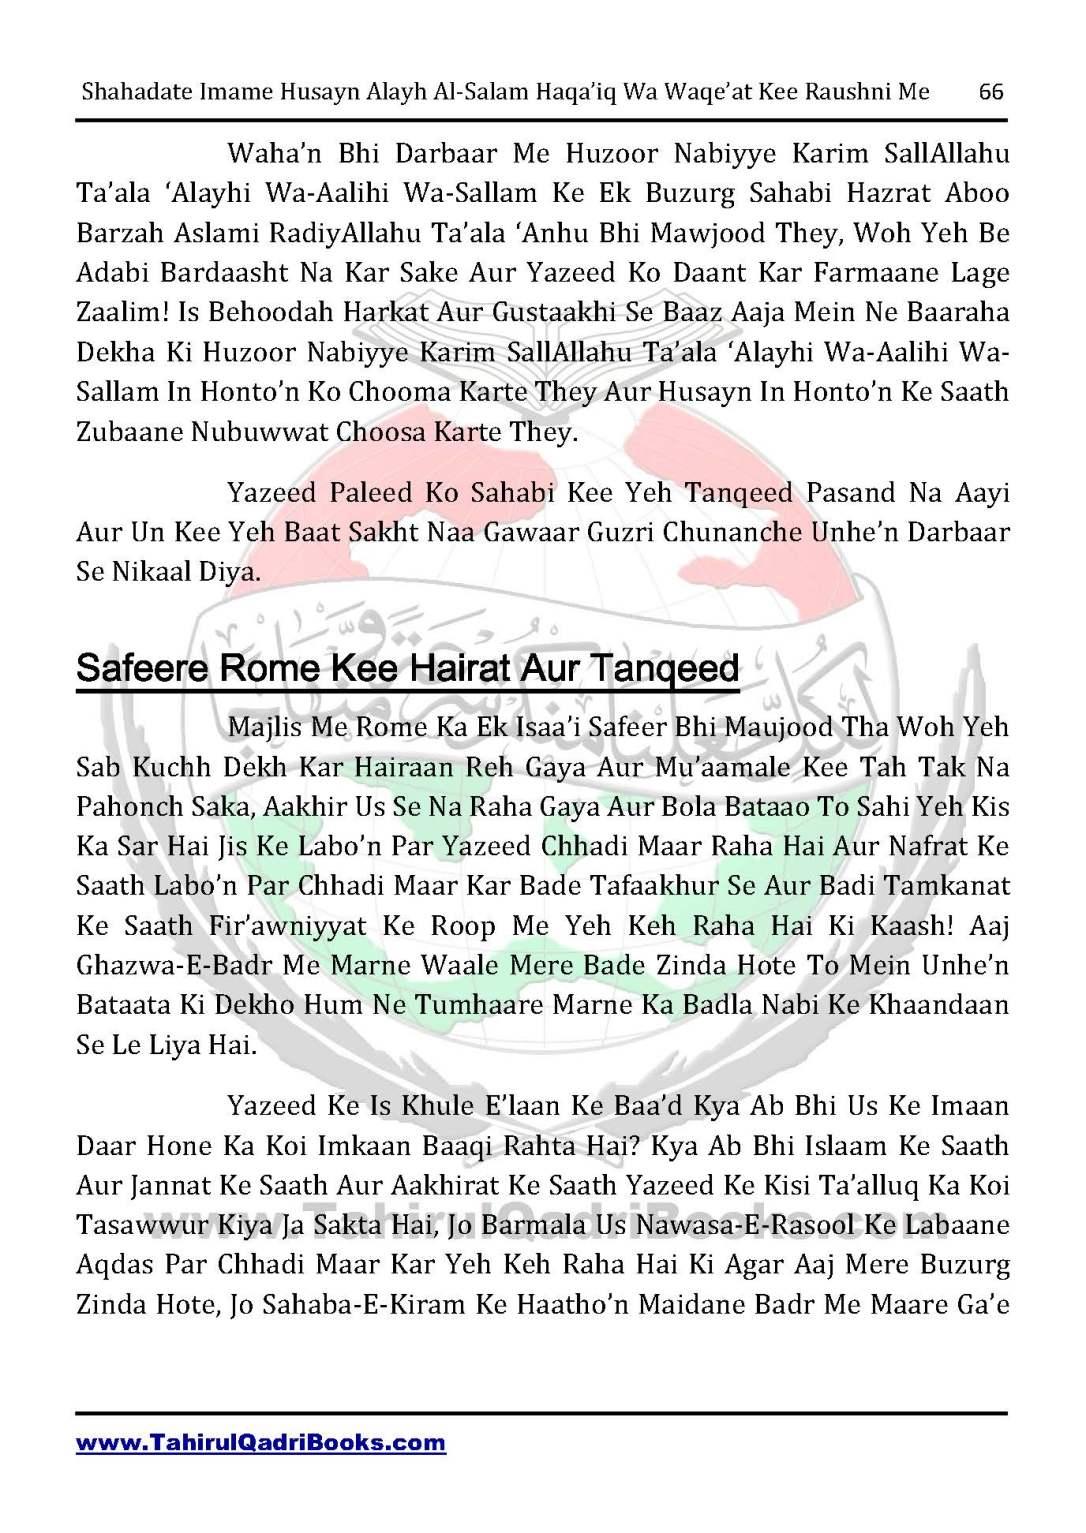 shahadate-imame-husayn-alayh-is-salam-haqaiq-wa-waqe_at-kee-raushni-me-in-roman-urdu-unlocked_Page_66